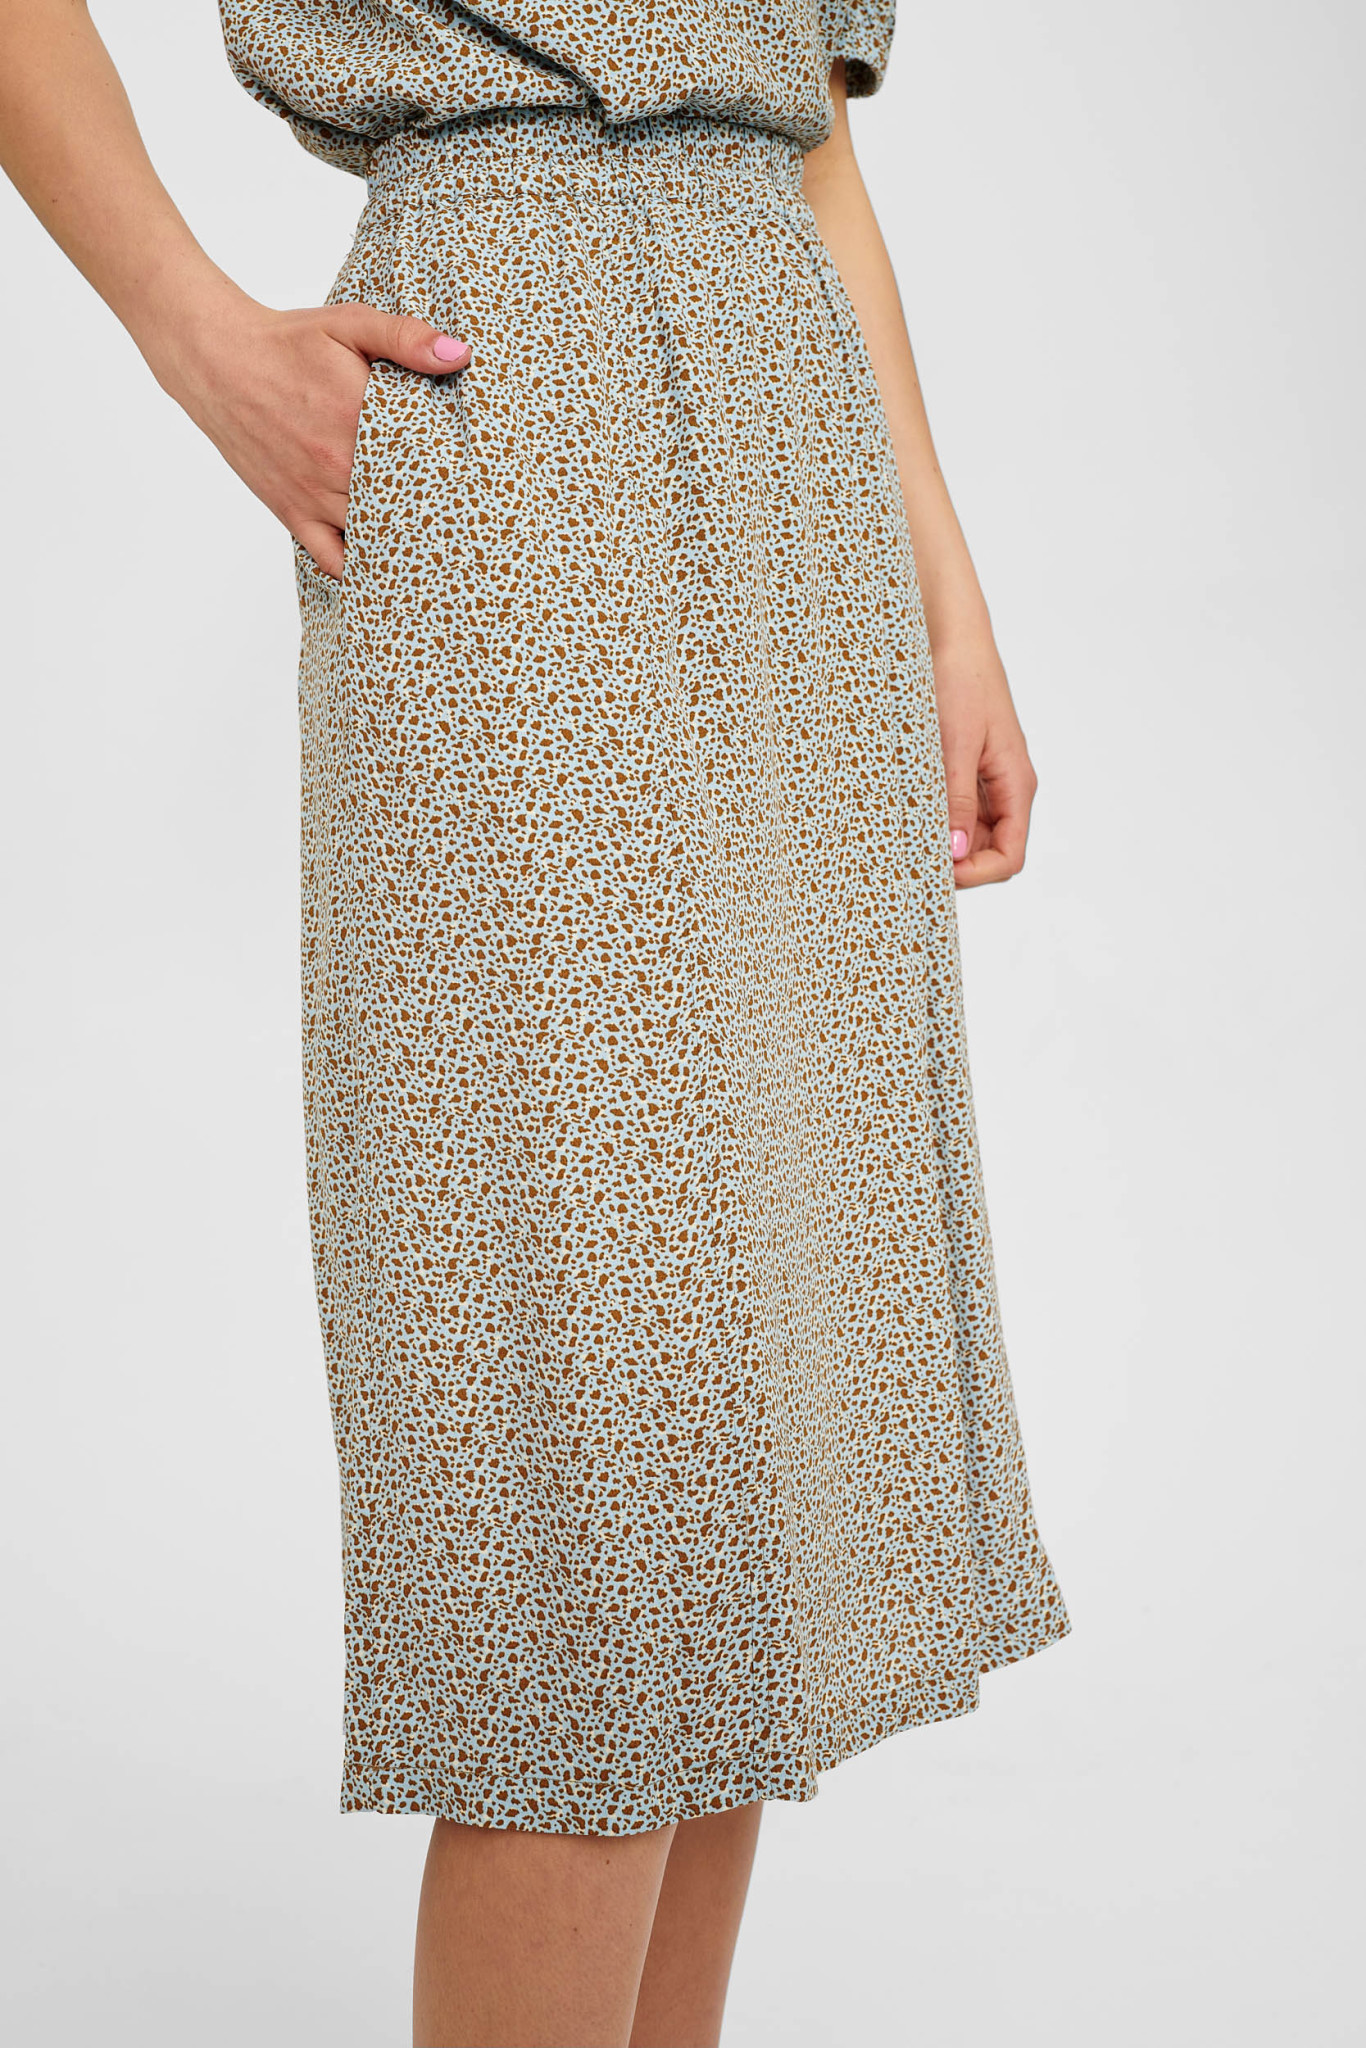 Nümph Cecelia Skirt - Blauw